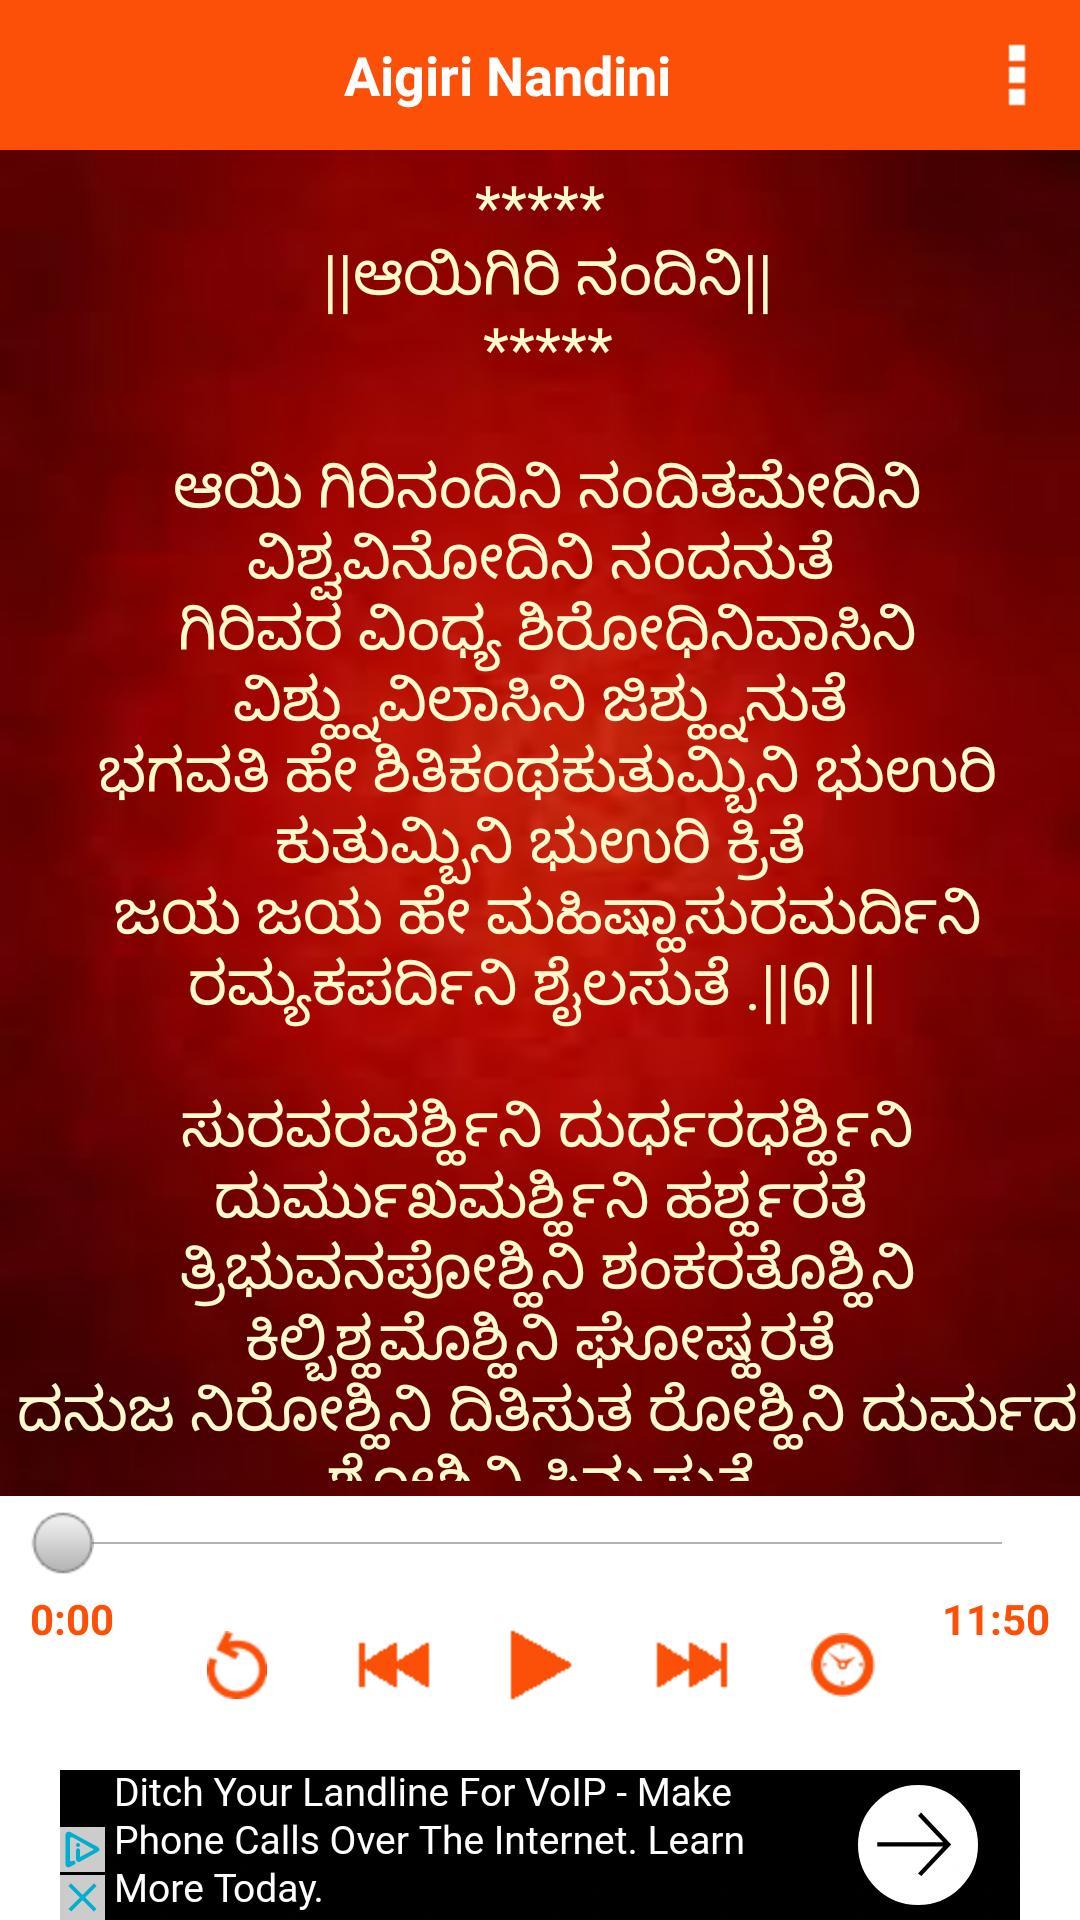 aigiri nandini lyrics in telugu mp3 free download